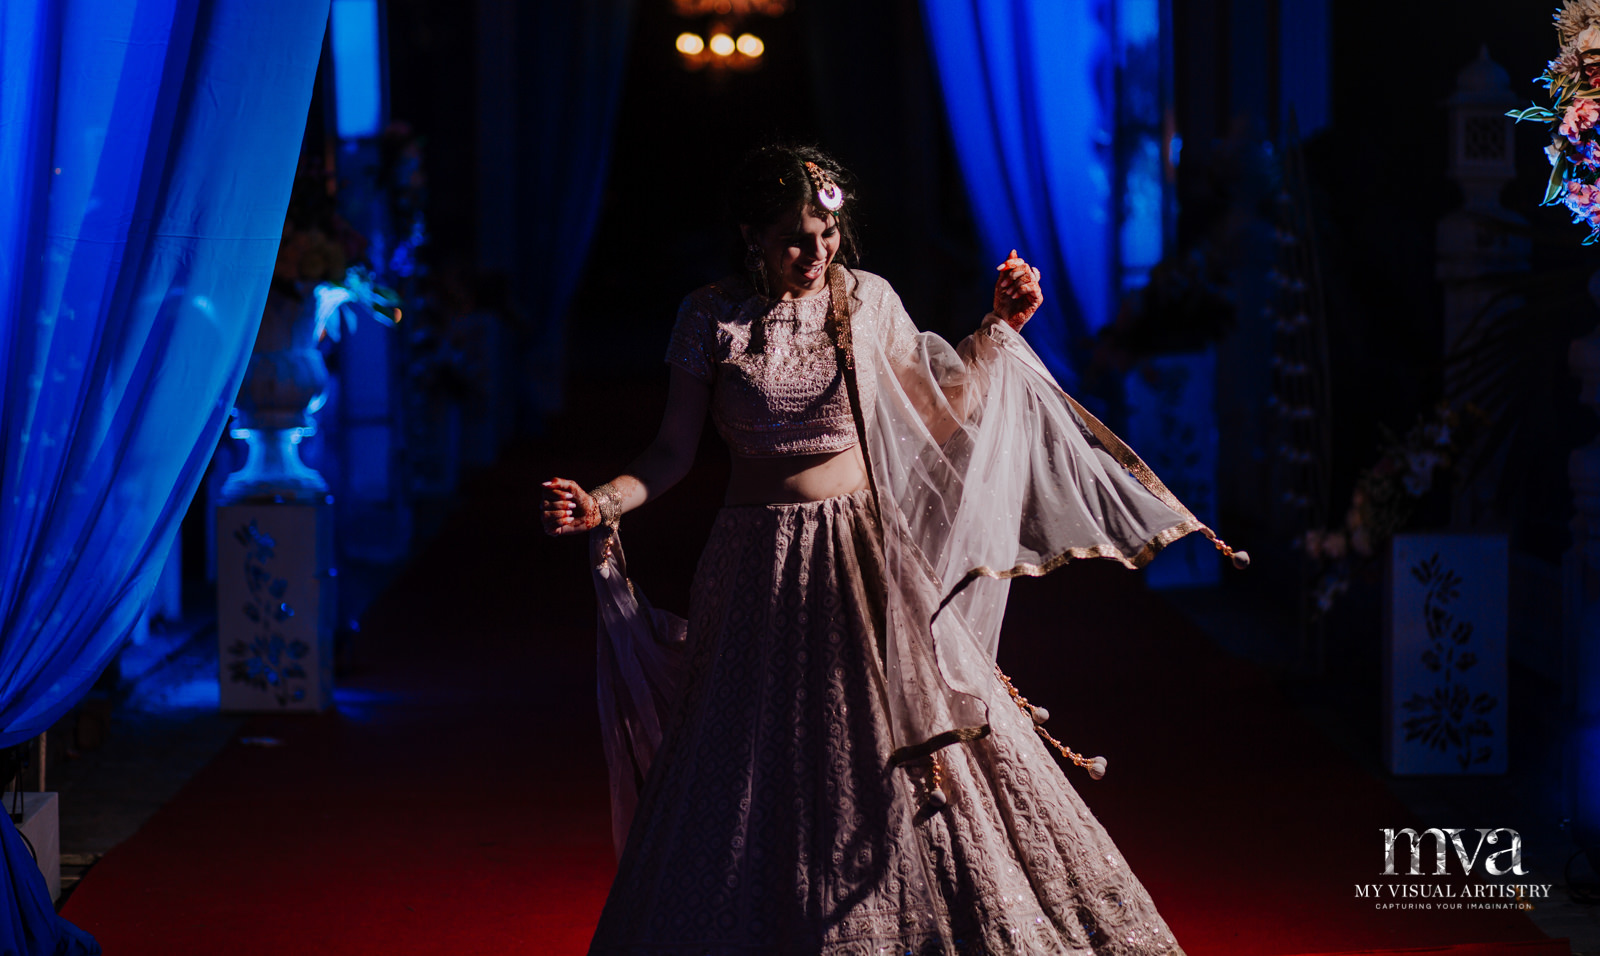 1065 -Vani_Sarang_ Photographer_My Visual Artistry_Wedding_MVA_Destination-9538.jpg